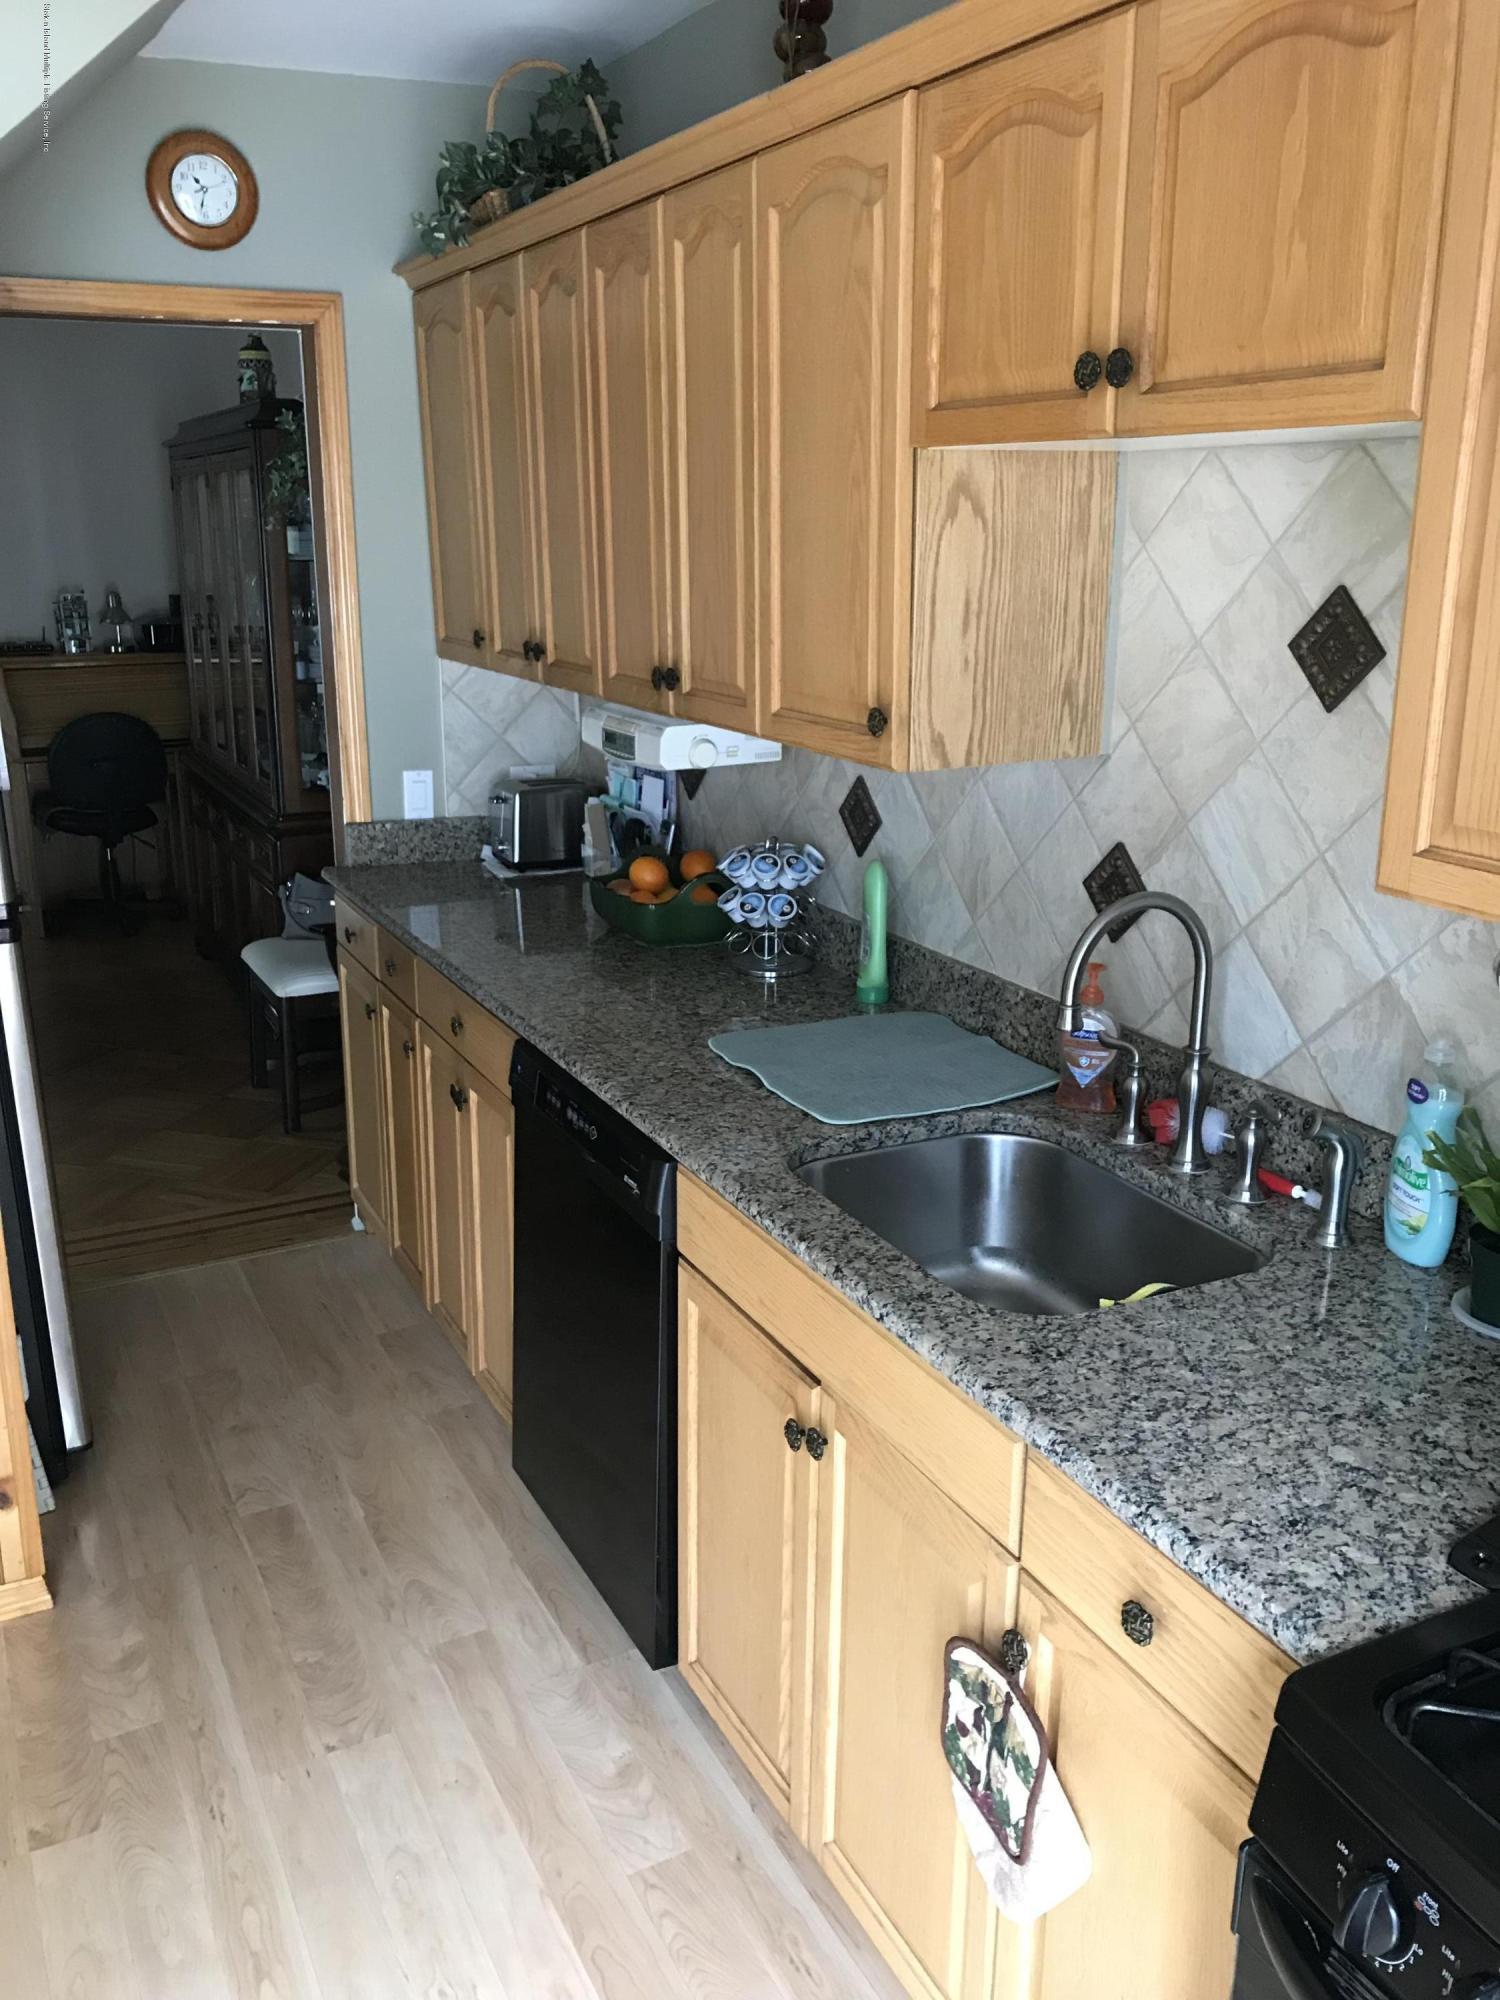 Single Family - Semi-Attached 94 Delafield Place  Staten Island, NY 10310, MLS-1128215-4